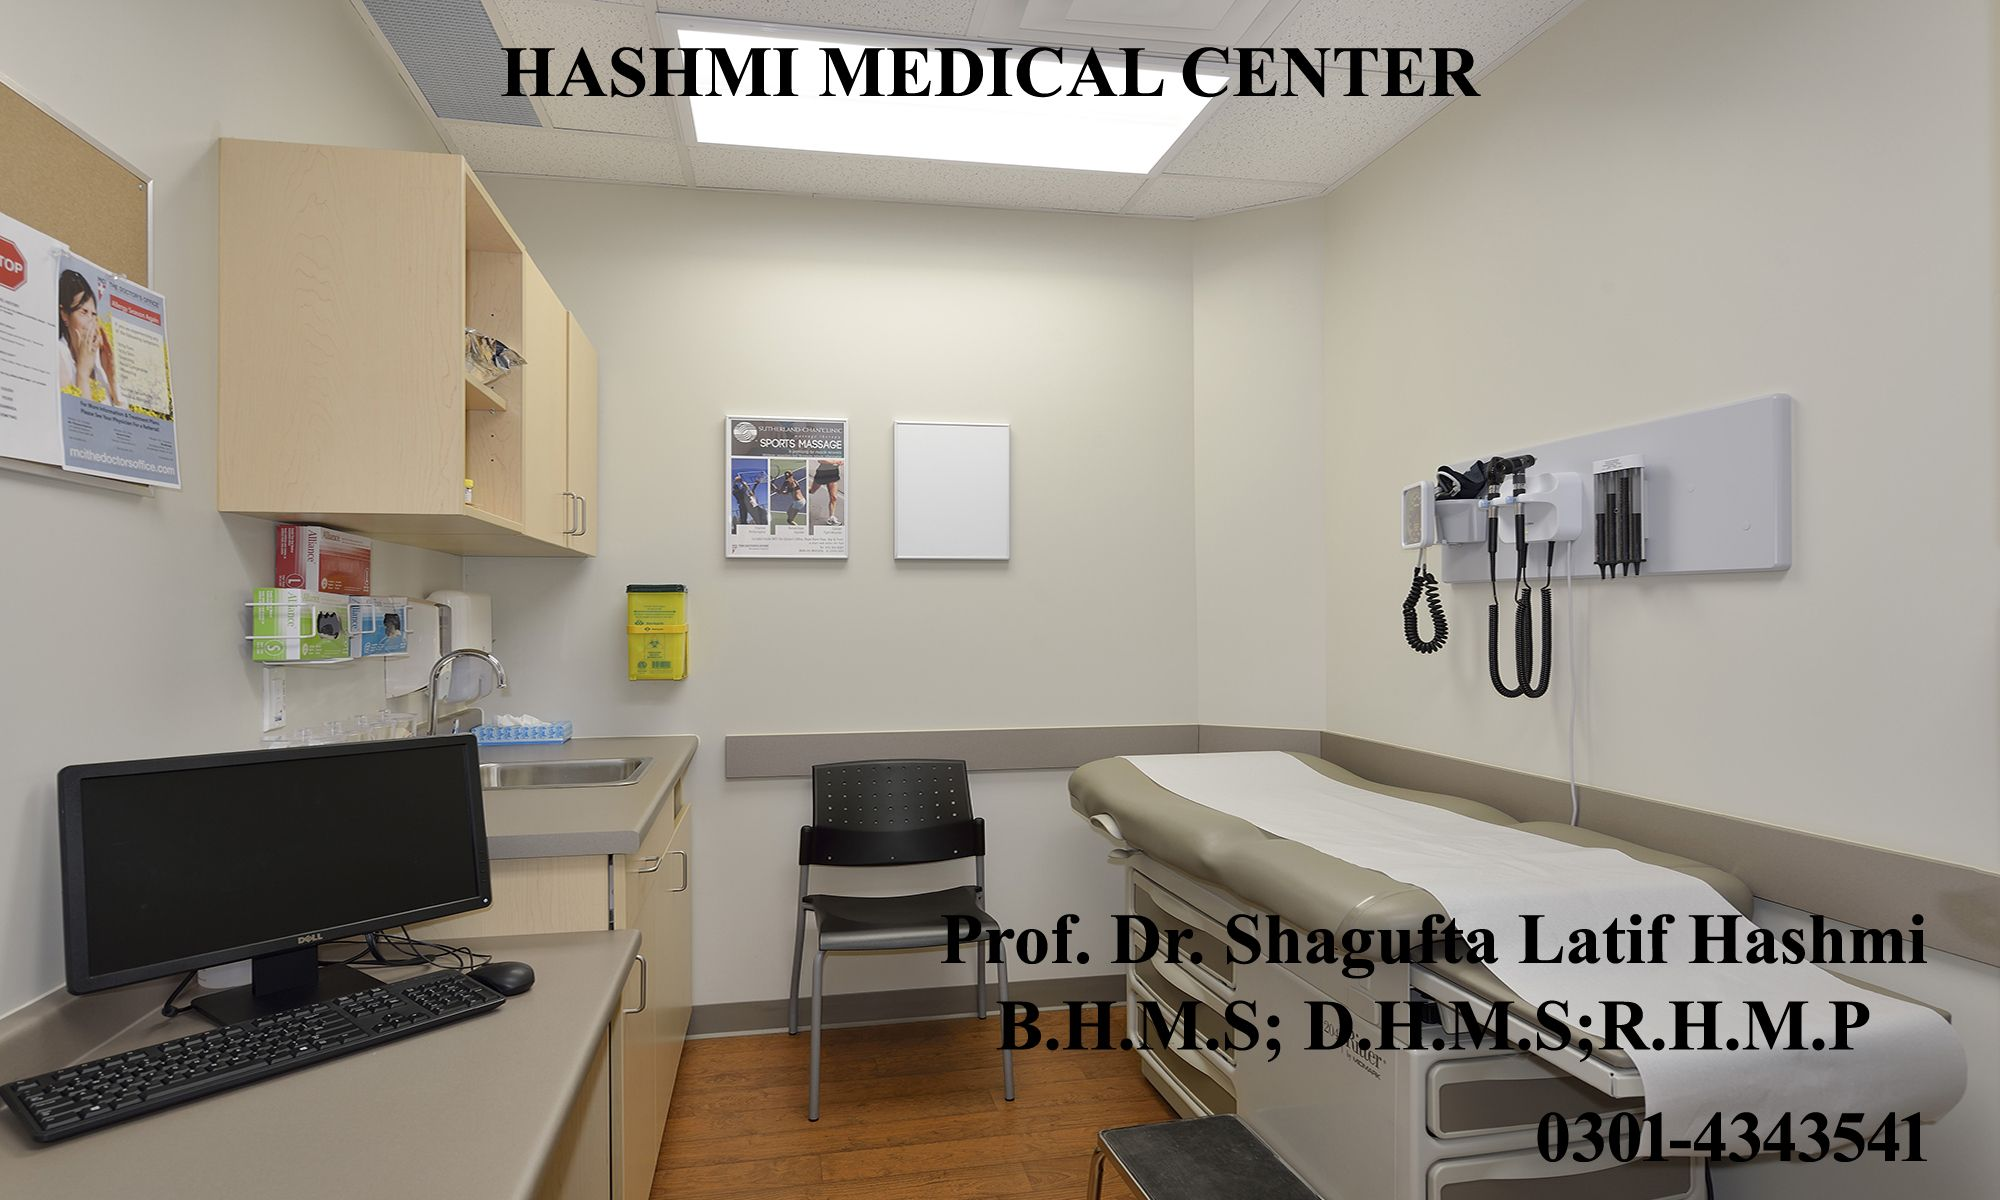 Hashmi Medical Center